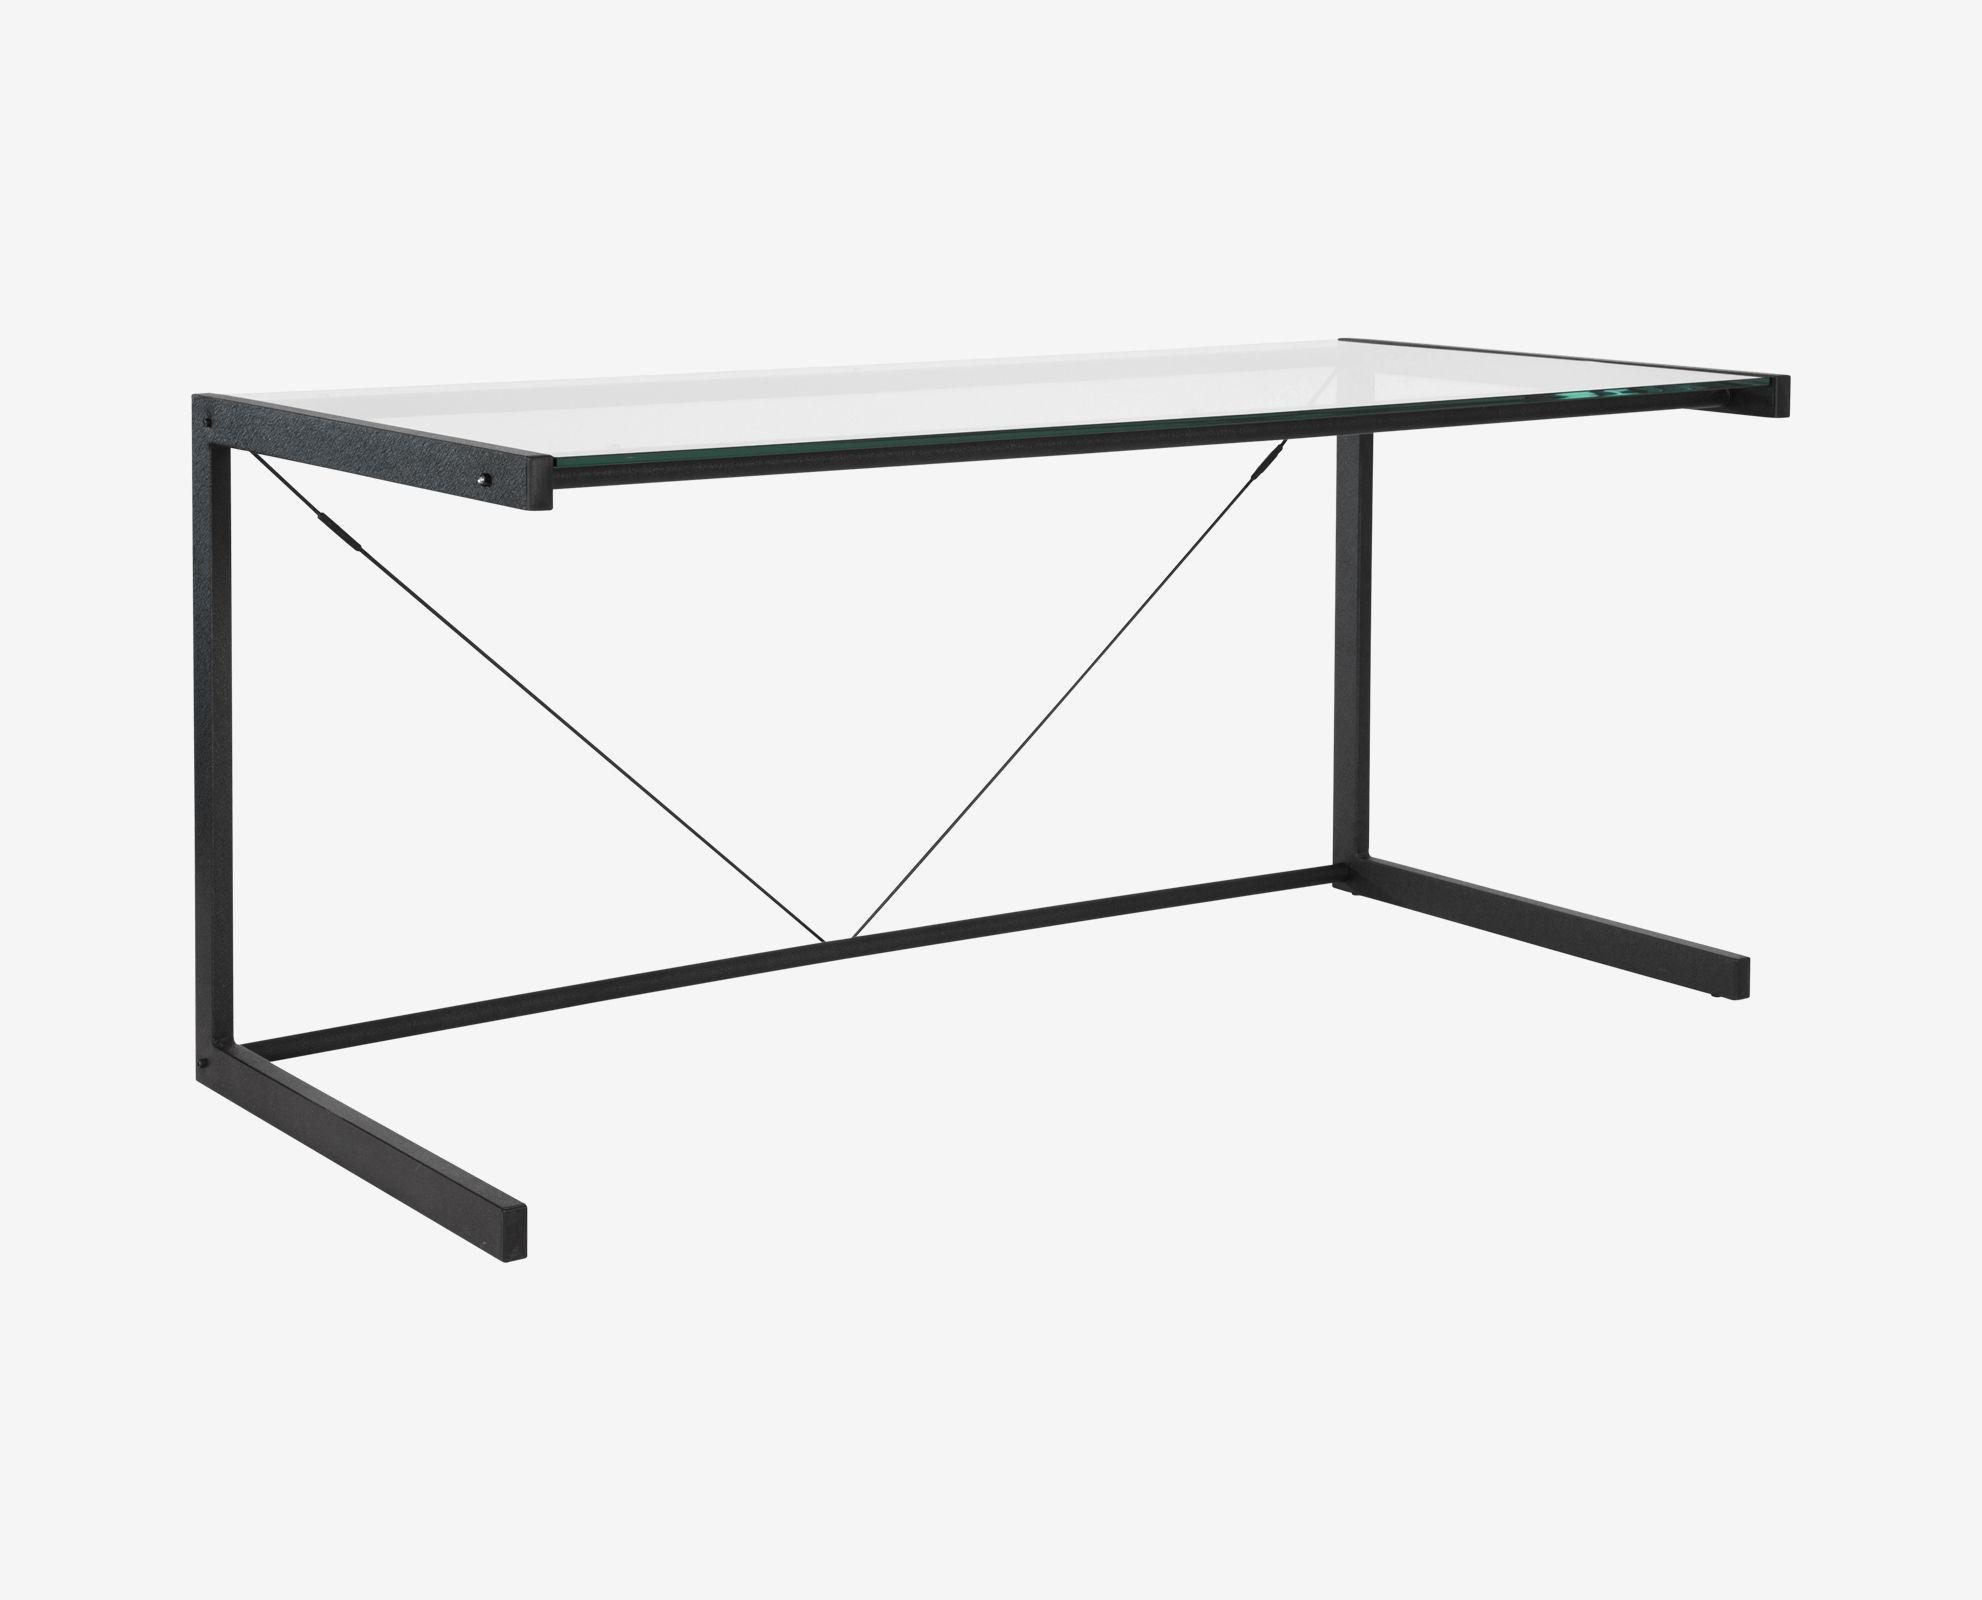 Ceo Desk Desks Scandinavian Designs Scandinavian Design Desk Scandinavian Office Furniture Ceo Desk